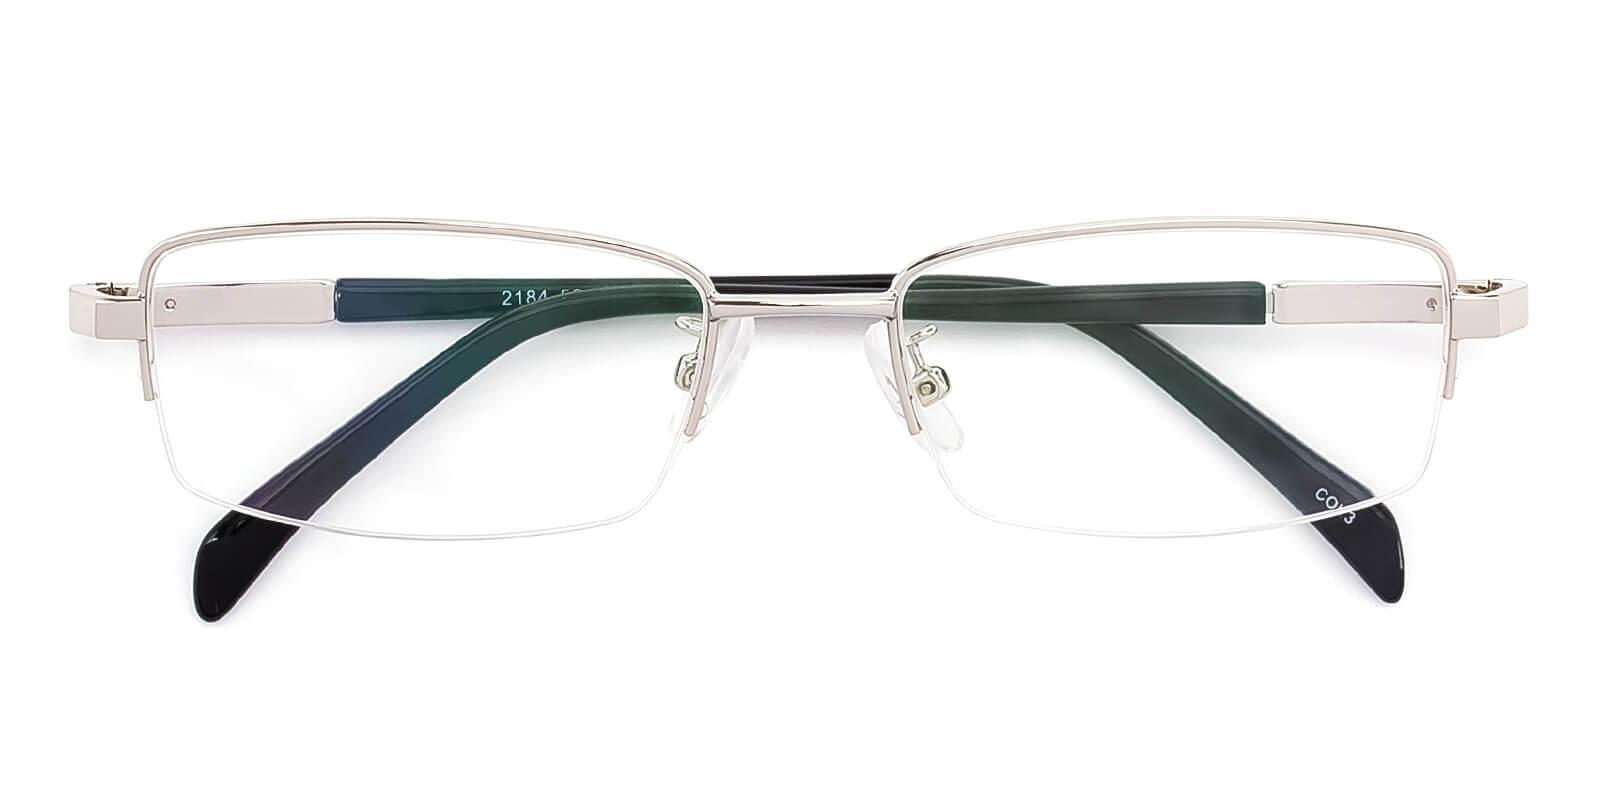 Furox-Silver-Rectangle-Metal-Eyeglasses-detail